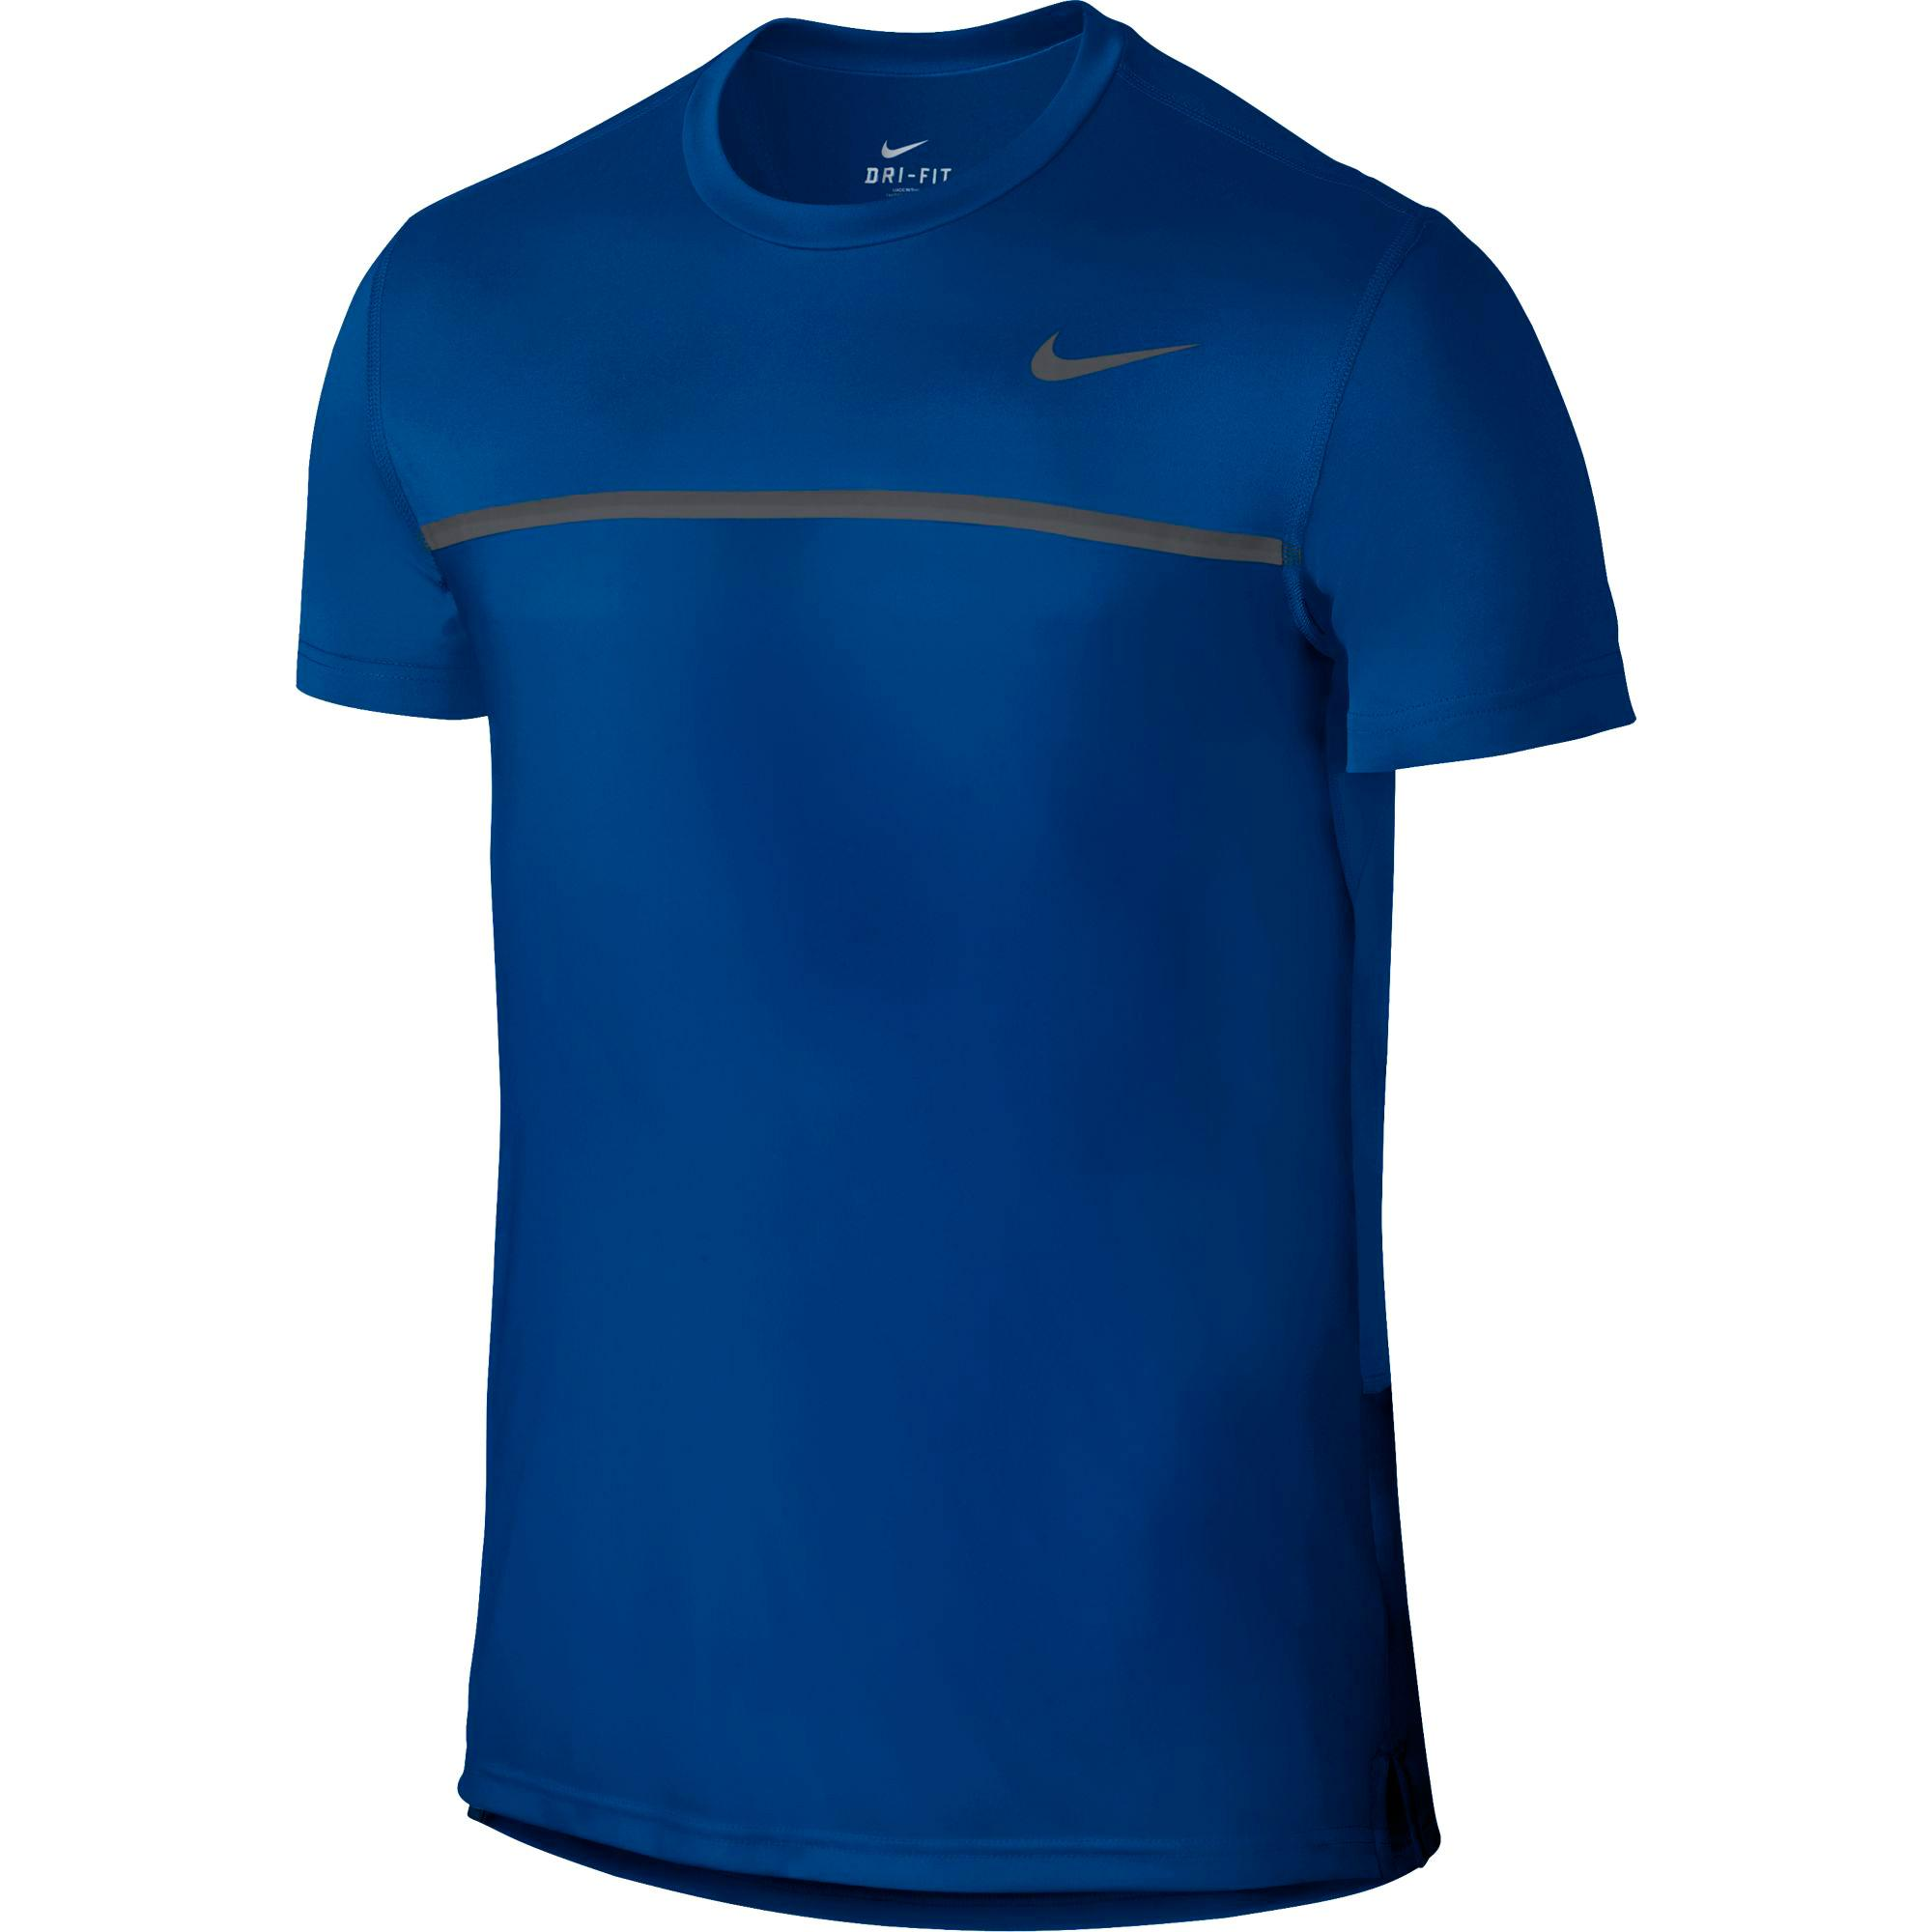 d7b8b511 Nike Mens Challenger Crew Neck Tennis Shirt - Blue Jay - Tennisnuts.com